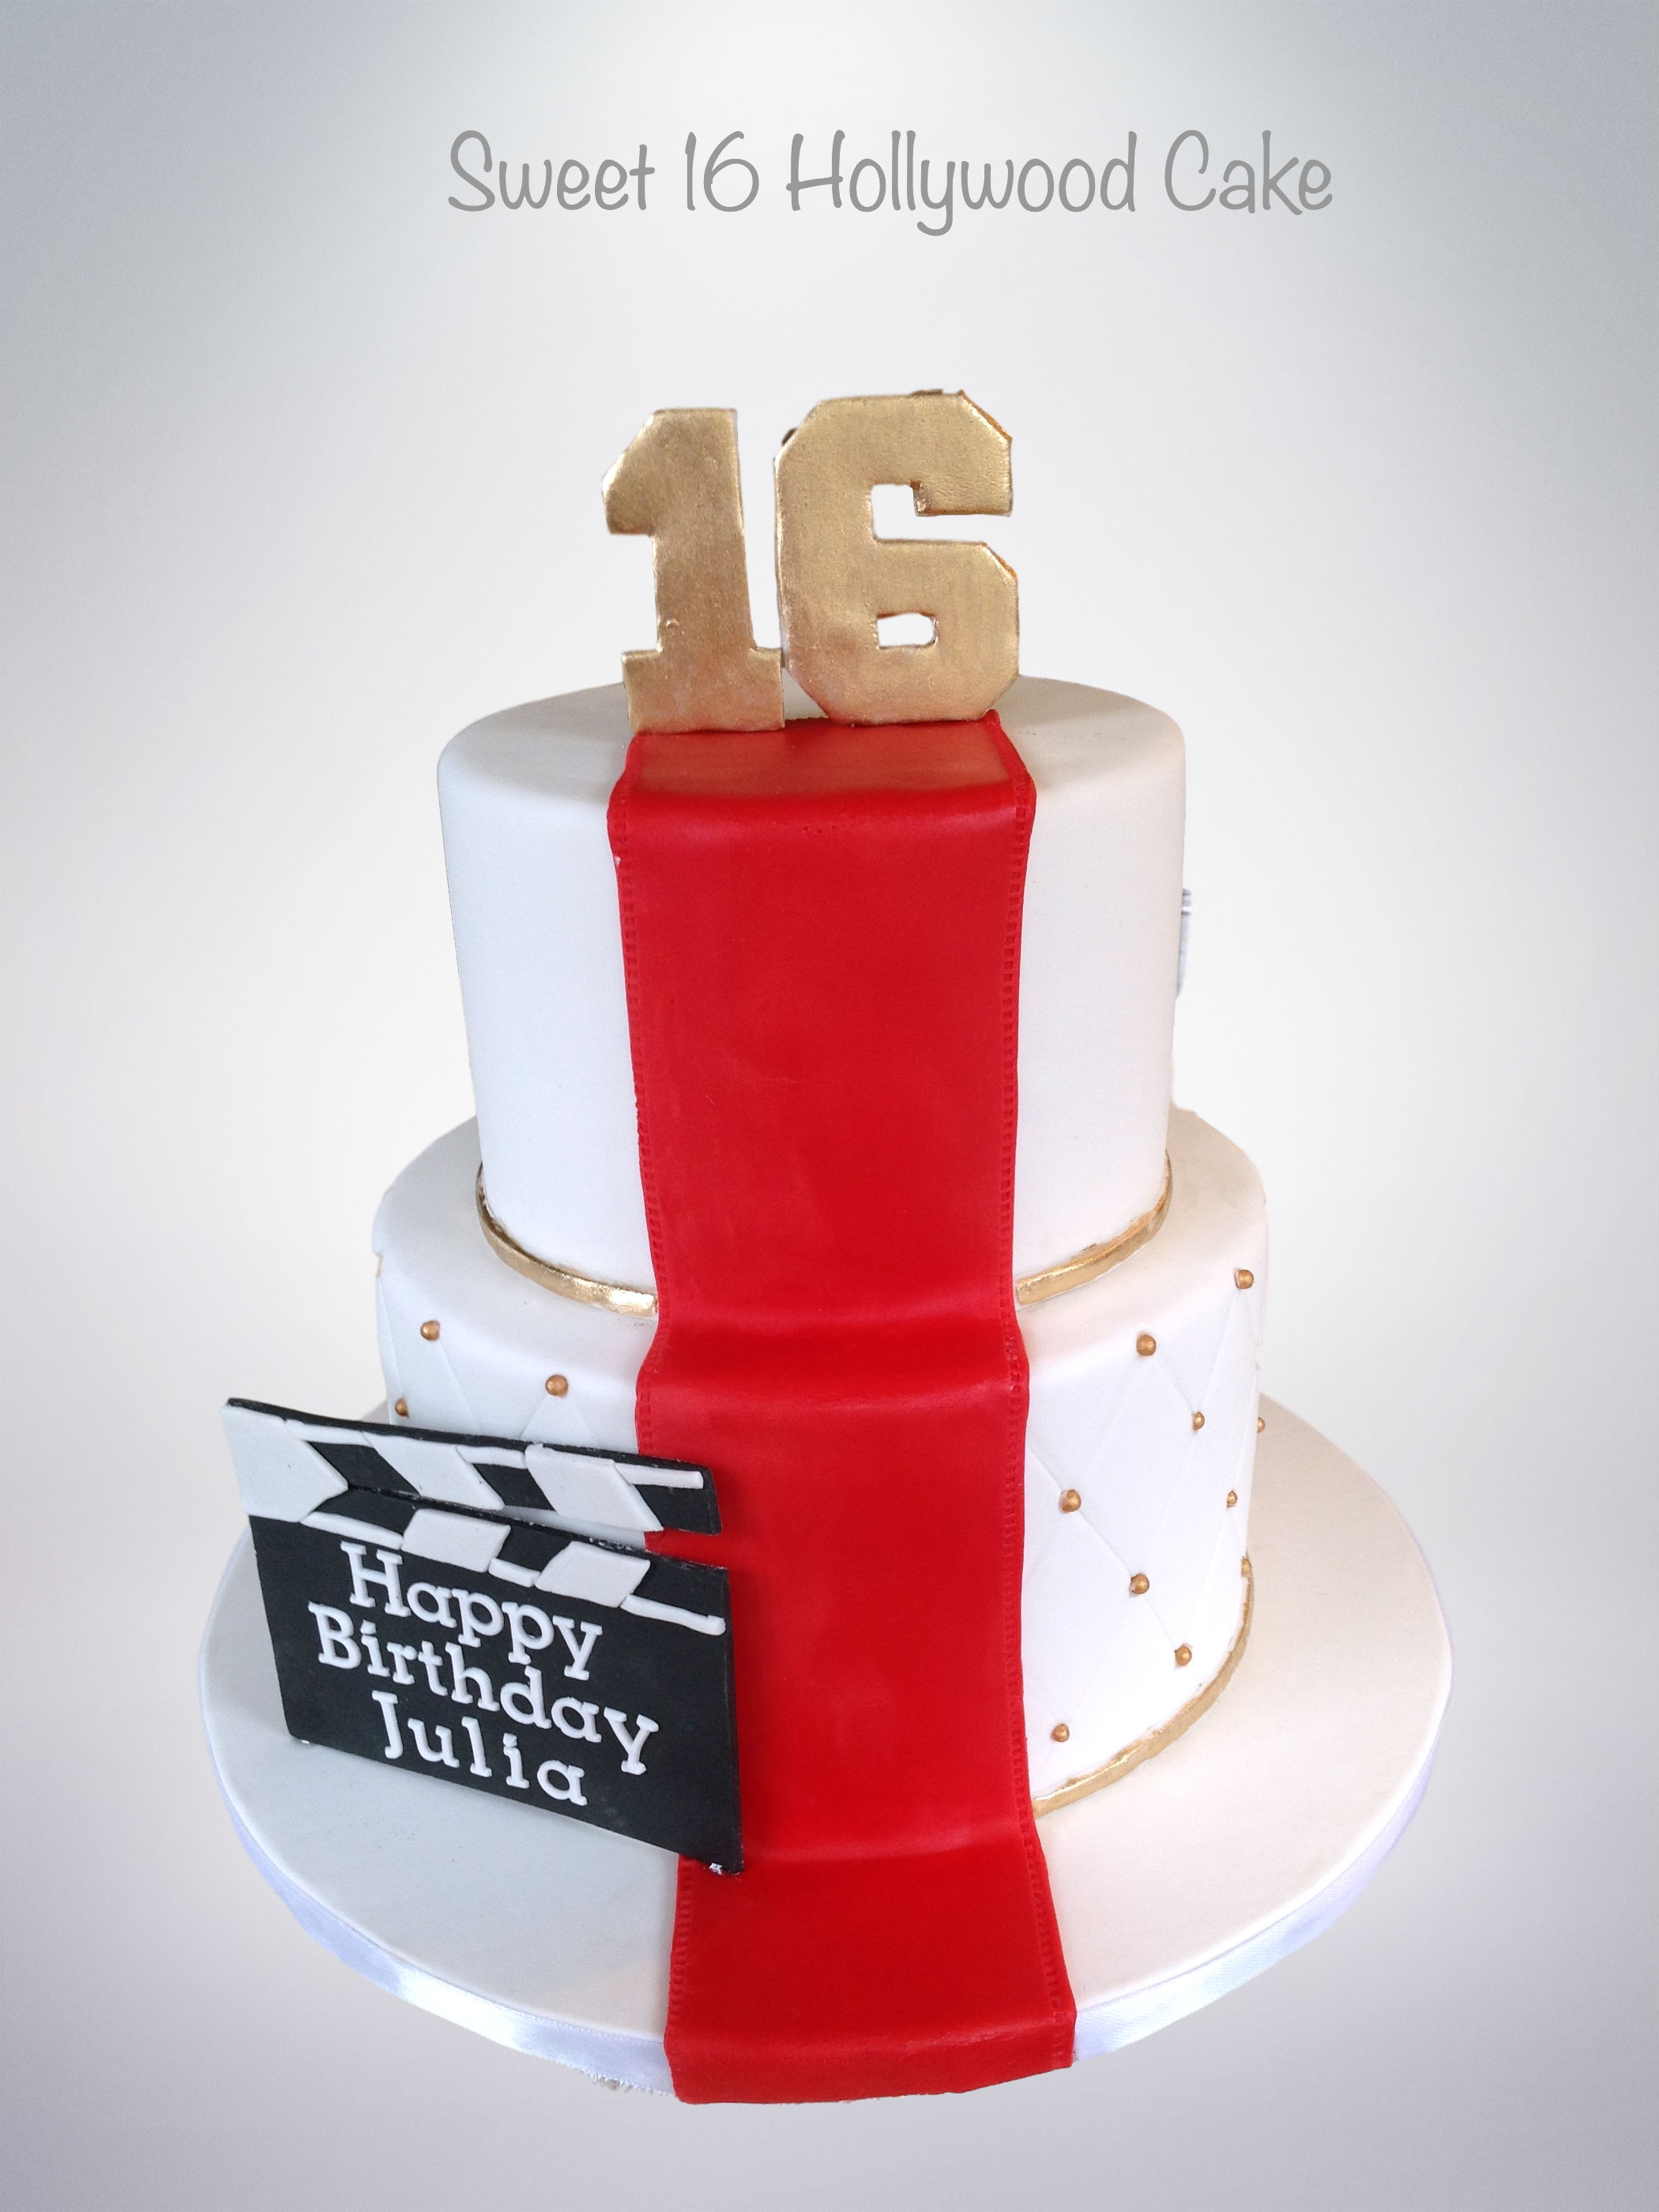 Astonishing Sweet 16 Hollywood Cake Cake Celebrations Monroe Ny Funny Birthday Cards Online Alyptdamsfinfo